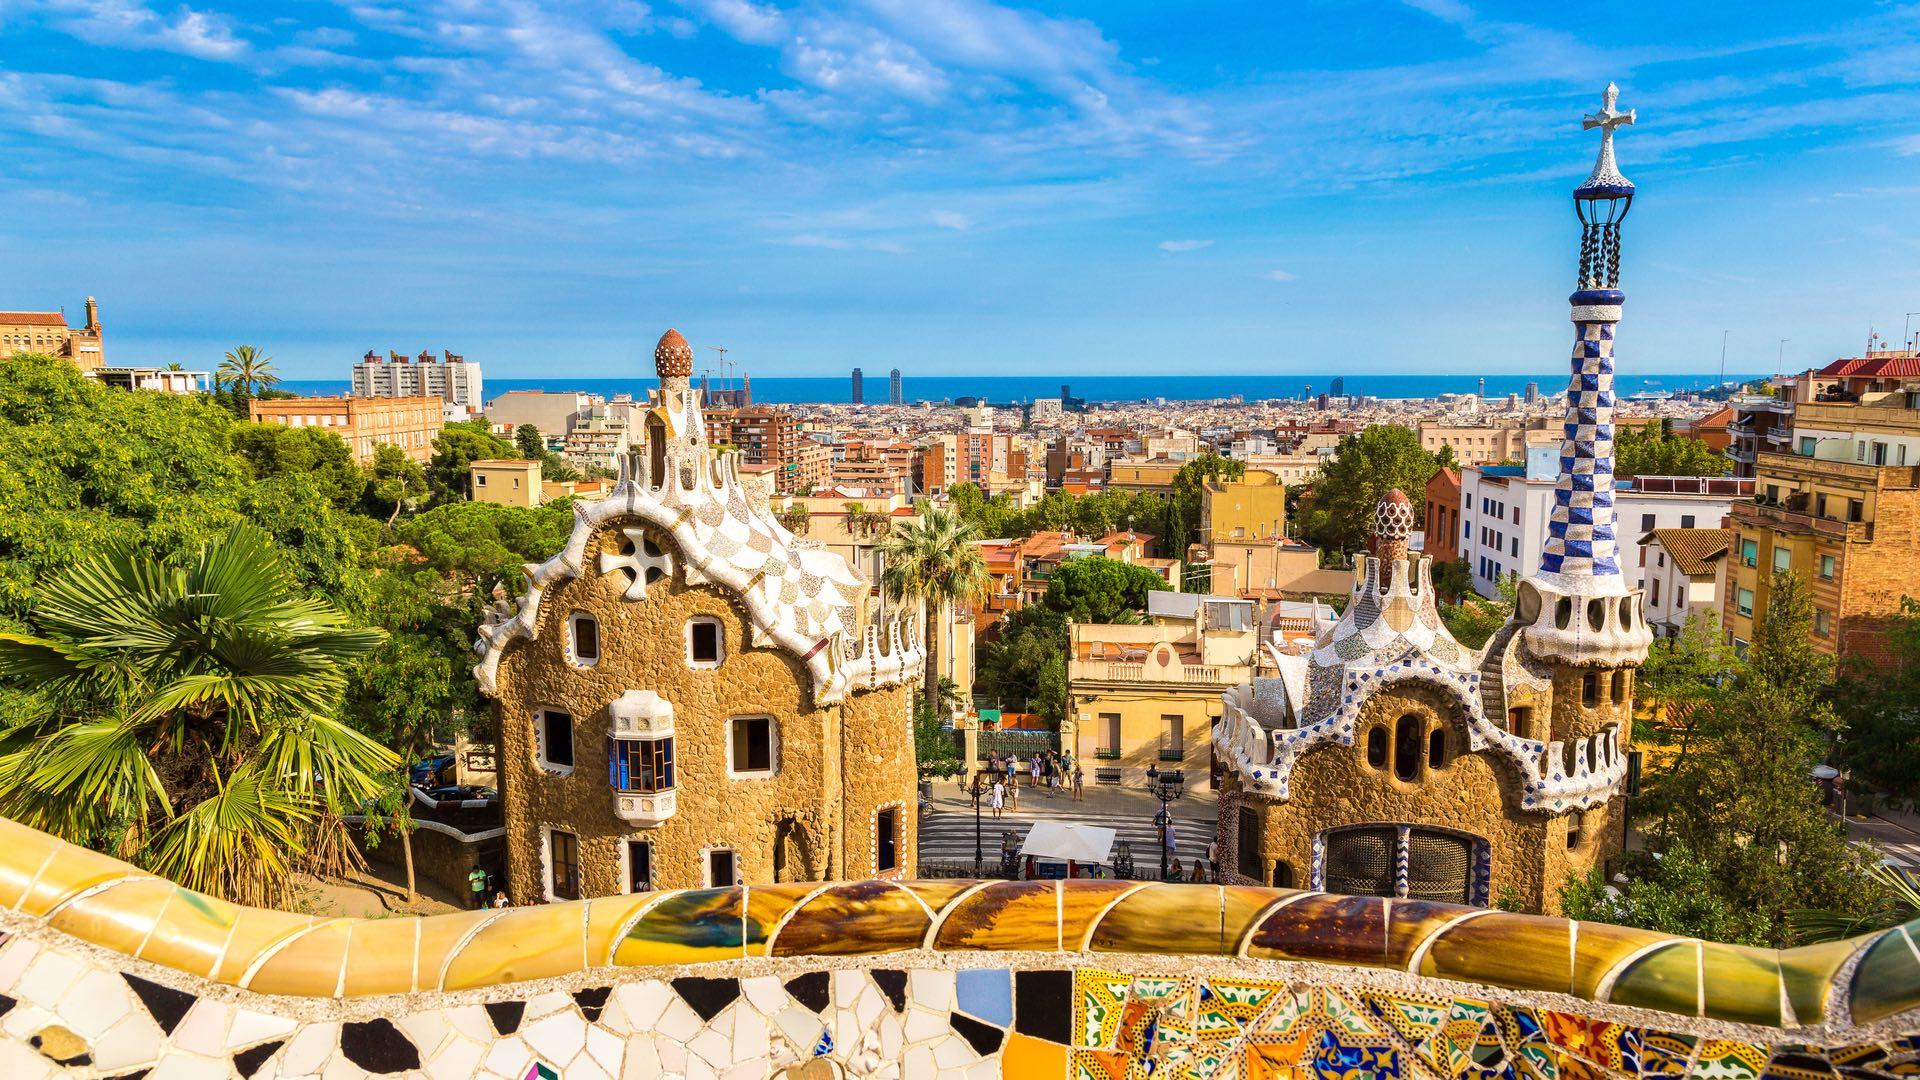 Spanien | Barcelona | ©S-F/shutterstock.com